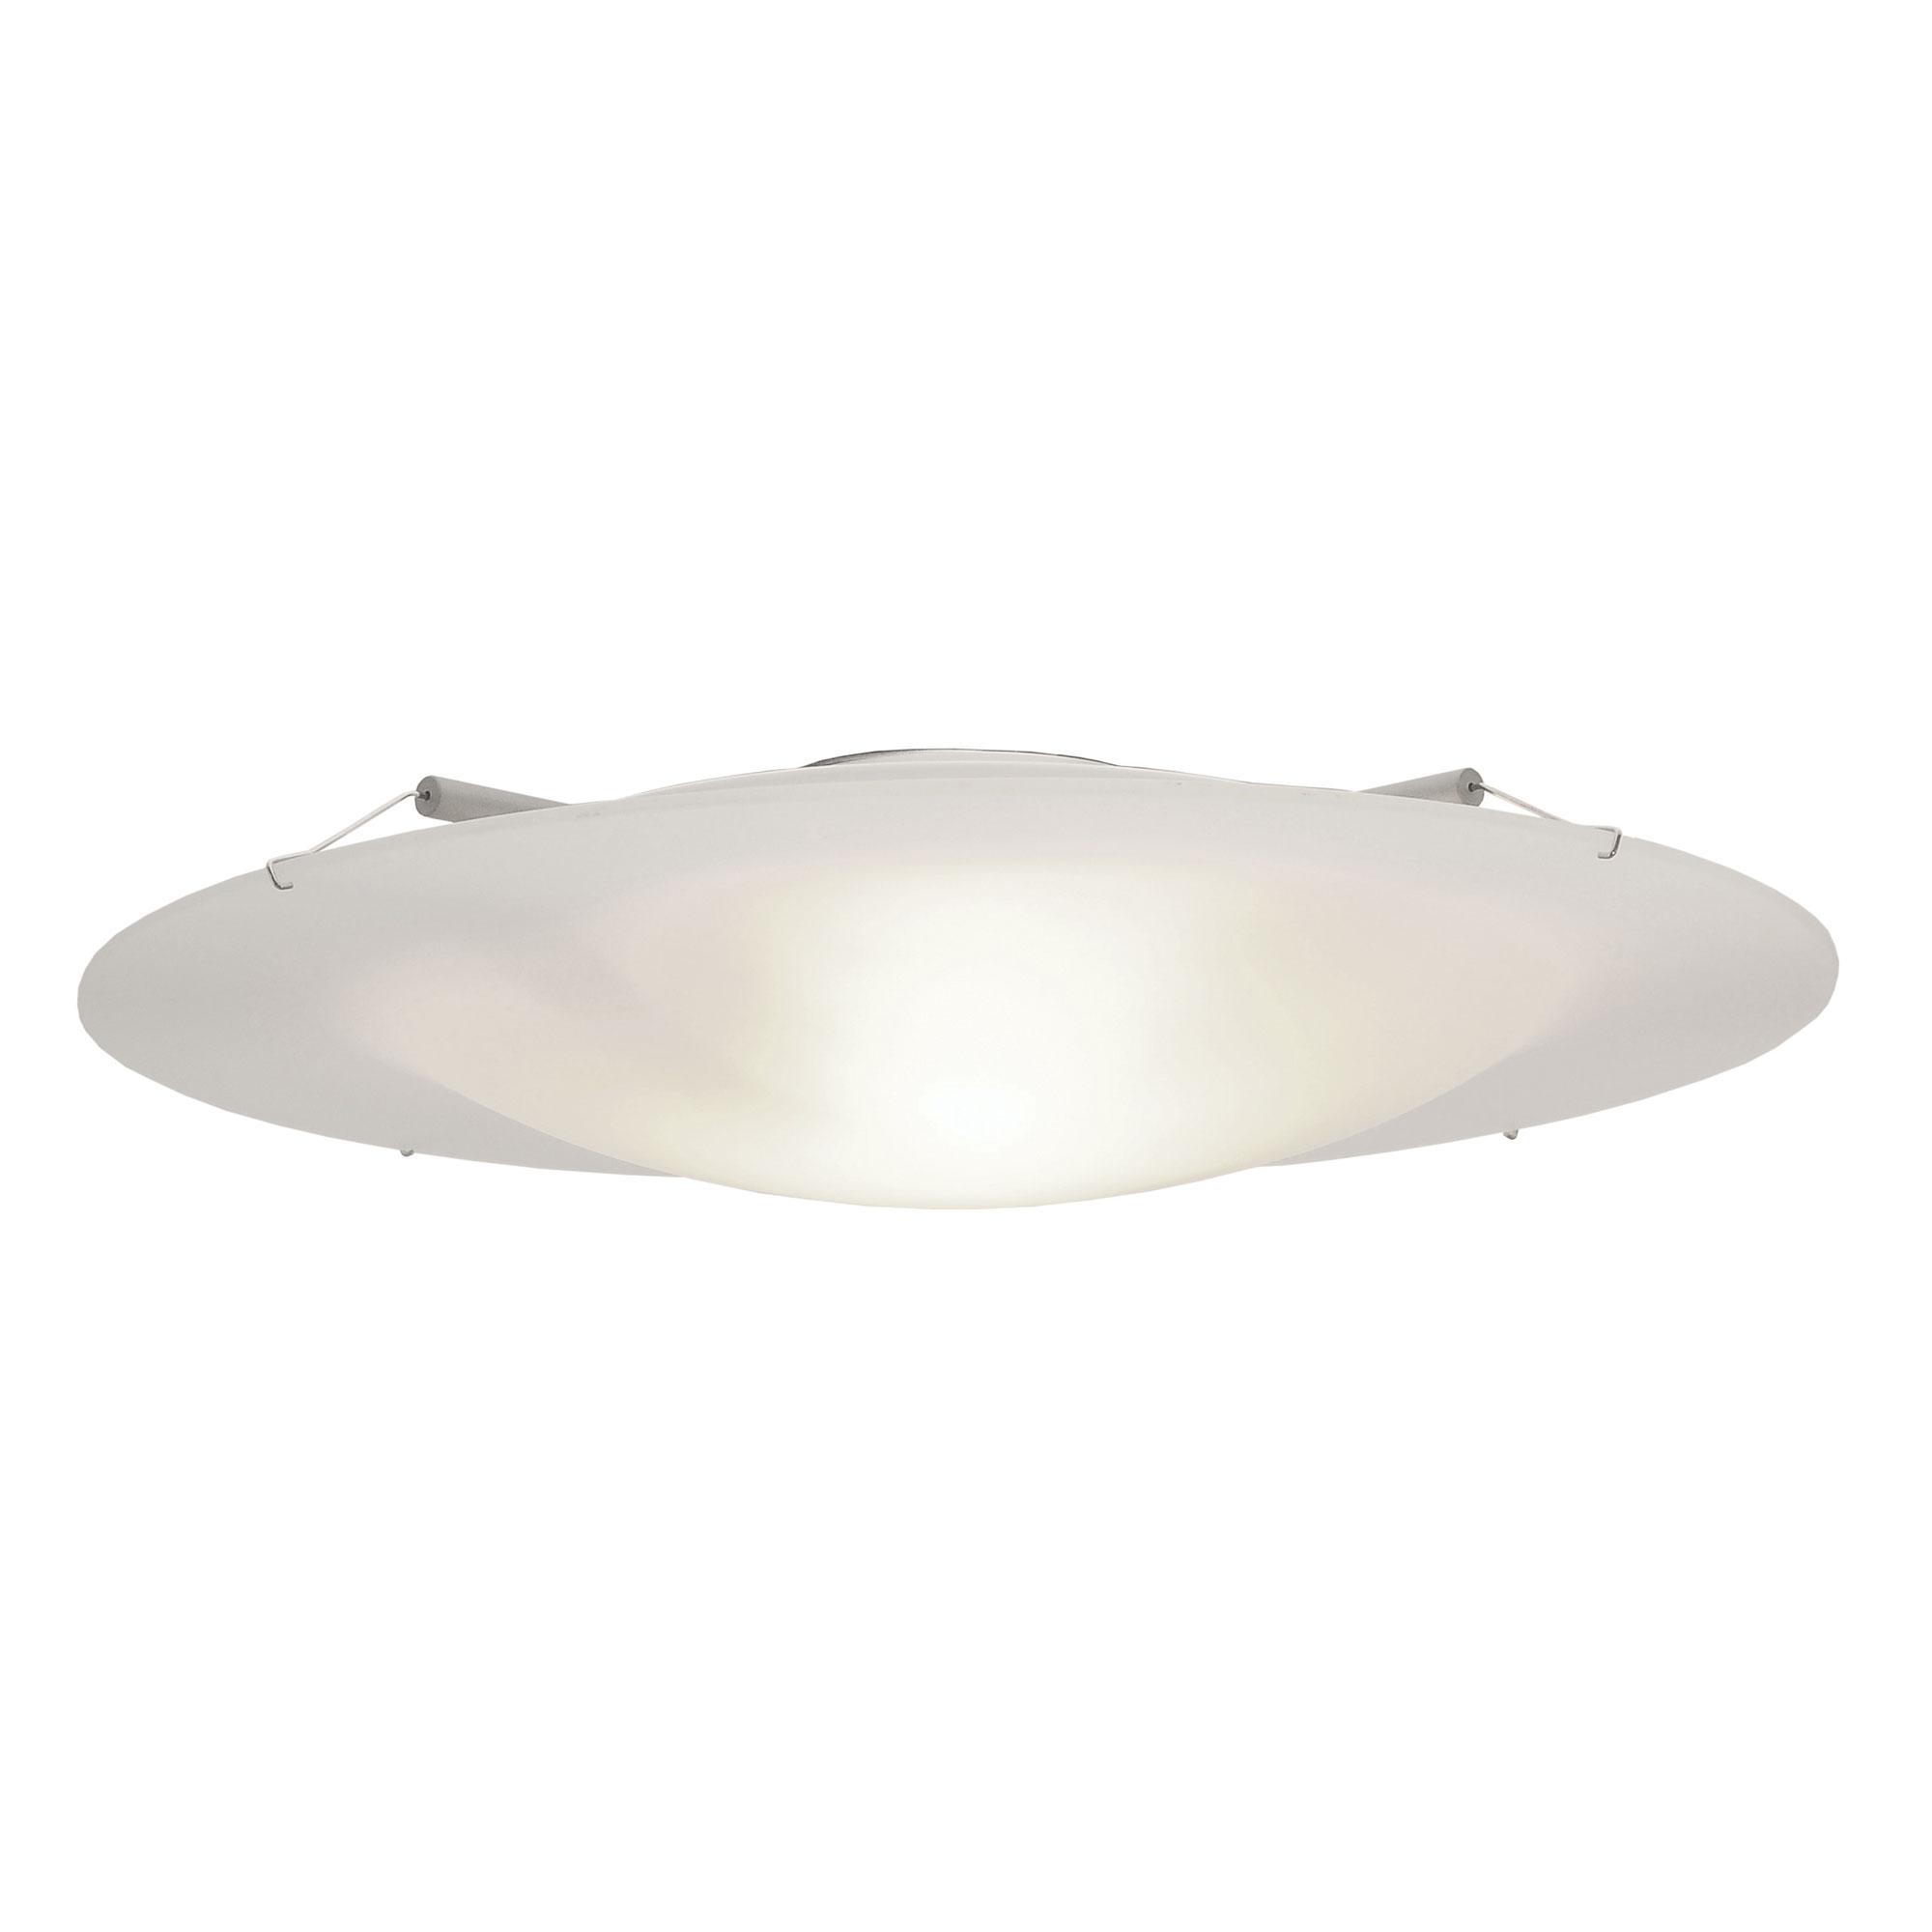 headlight kit picture car white bulbs xenon of accessories feeldo lamp cob store light super fog bright official led